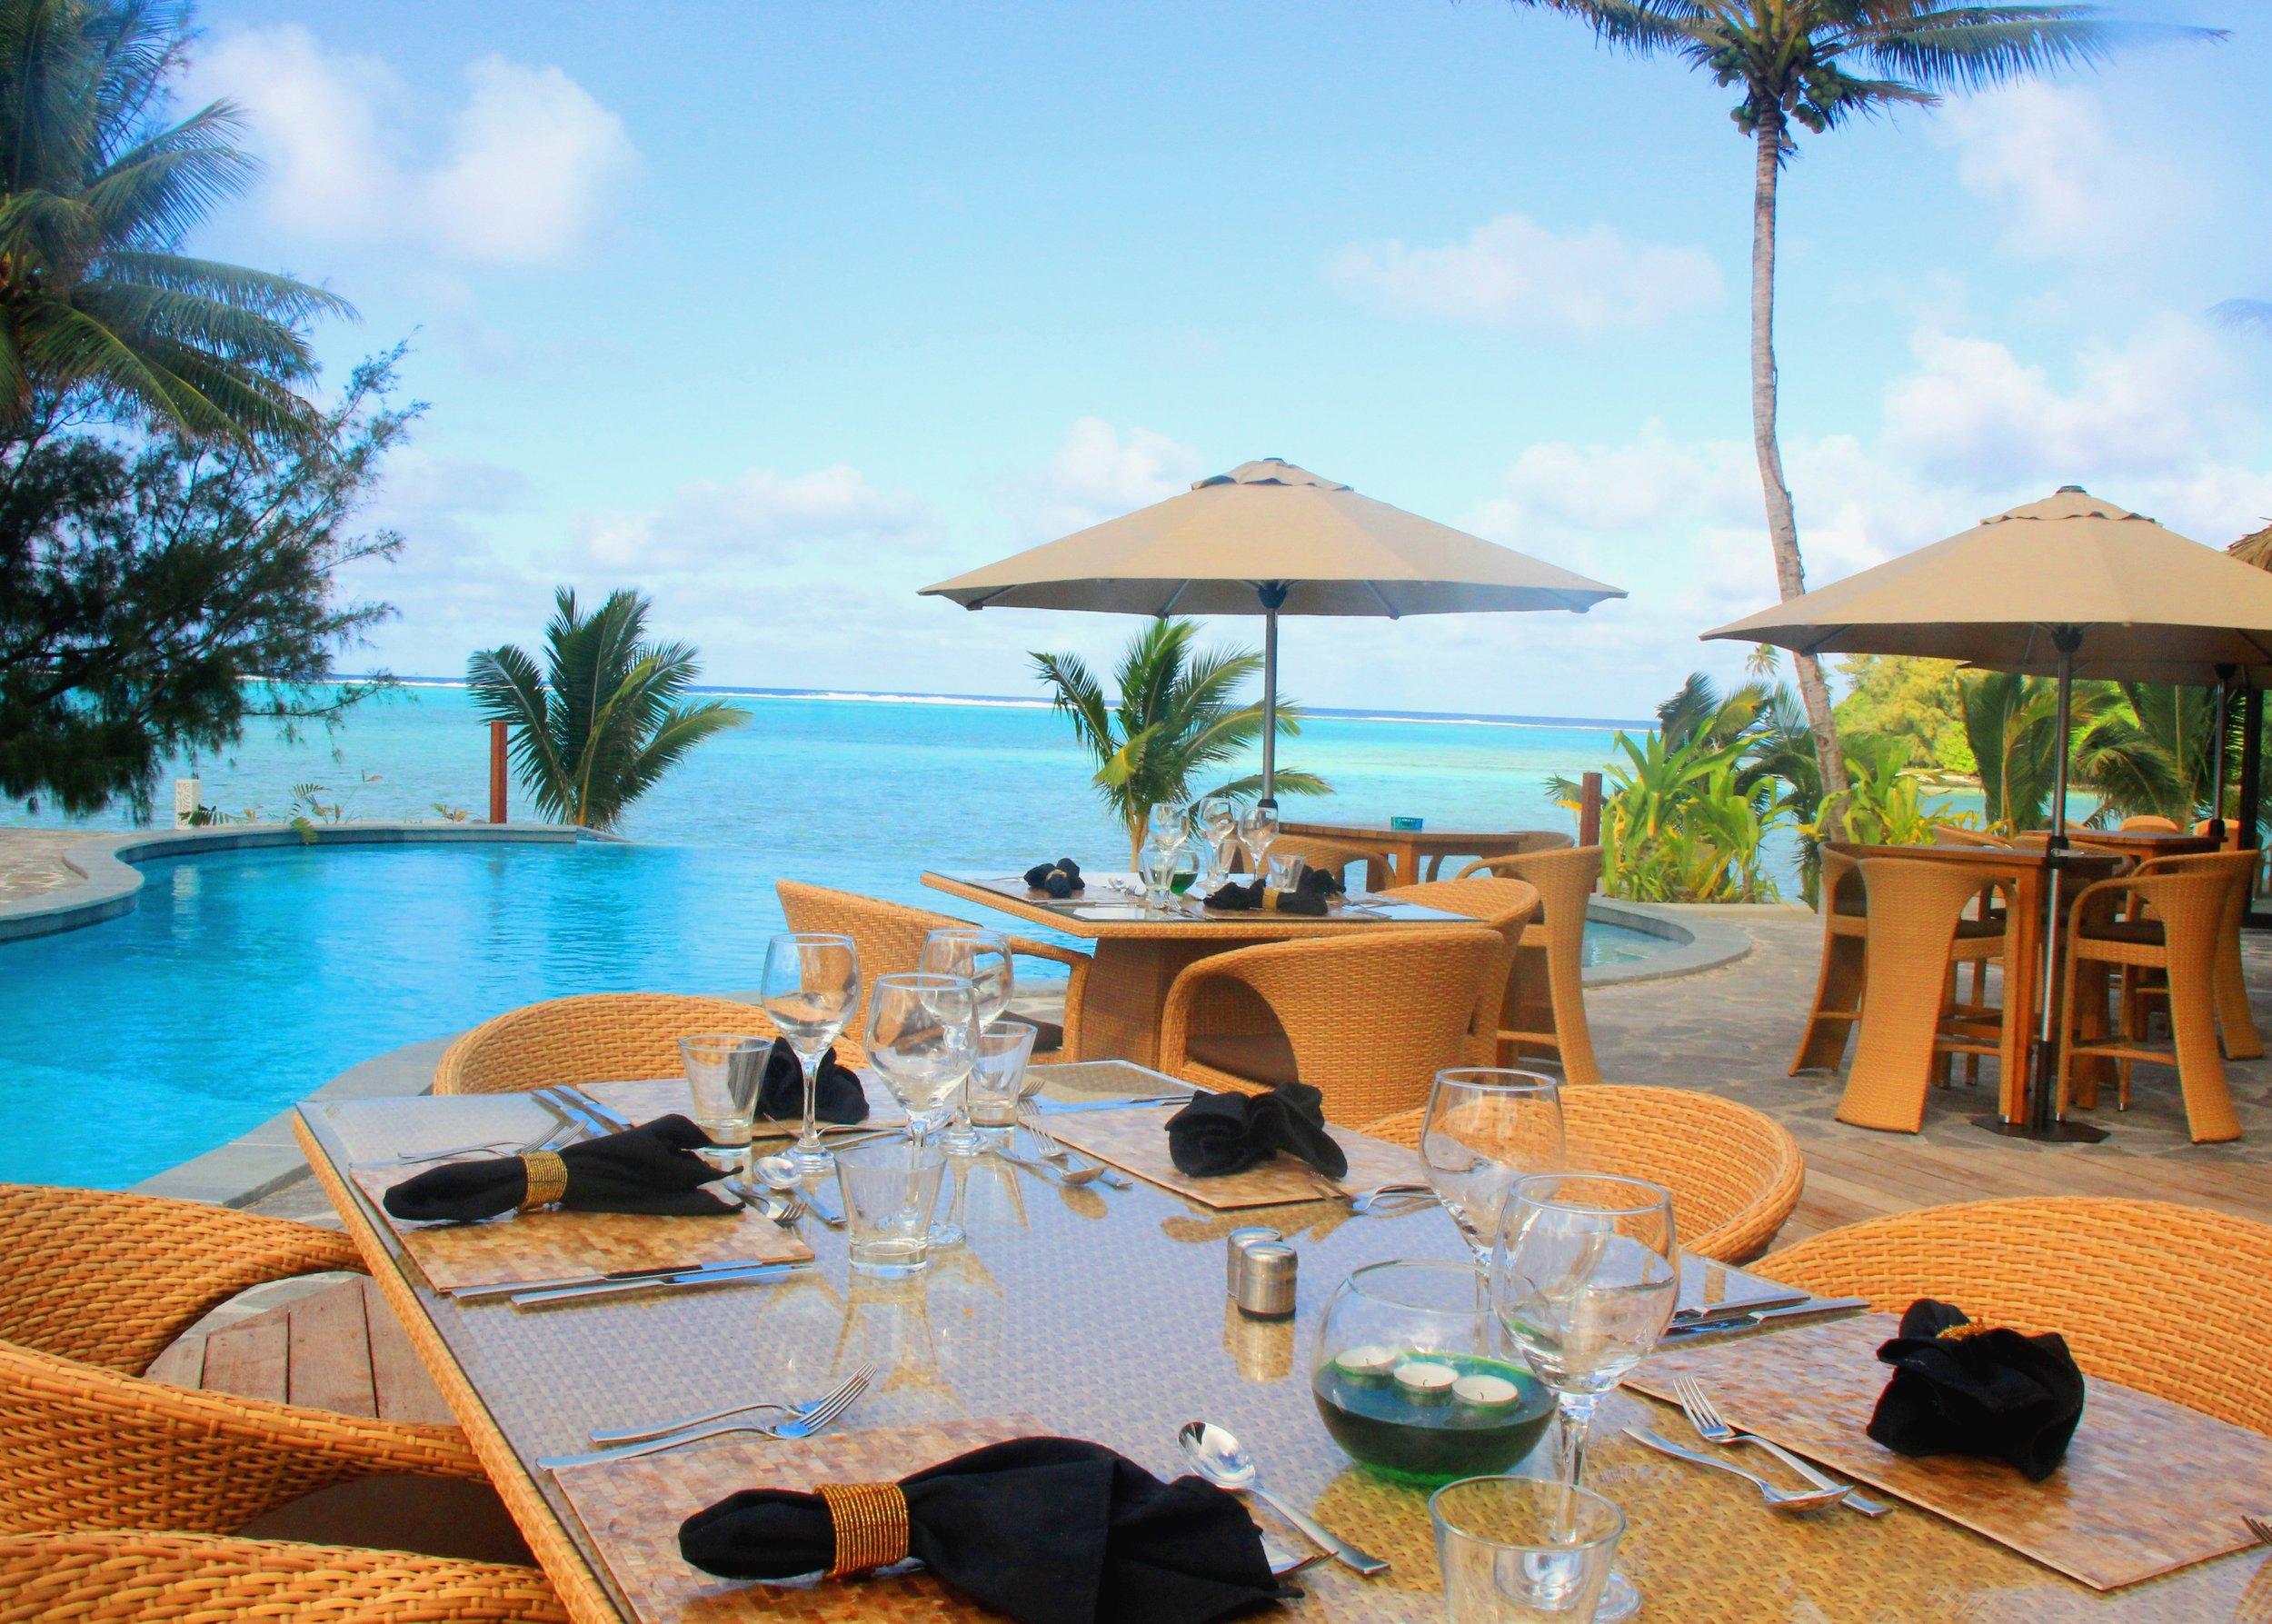 5.Dining Poolside at Nautilus.jpg